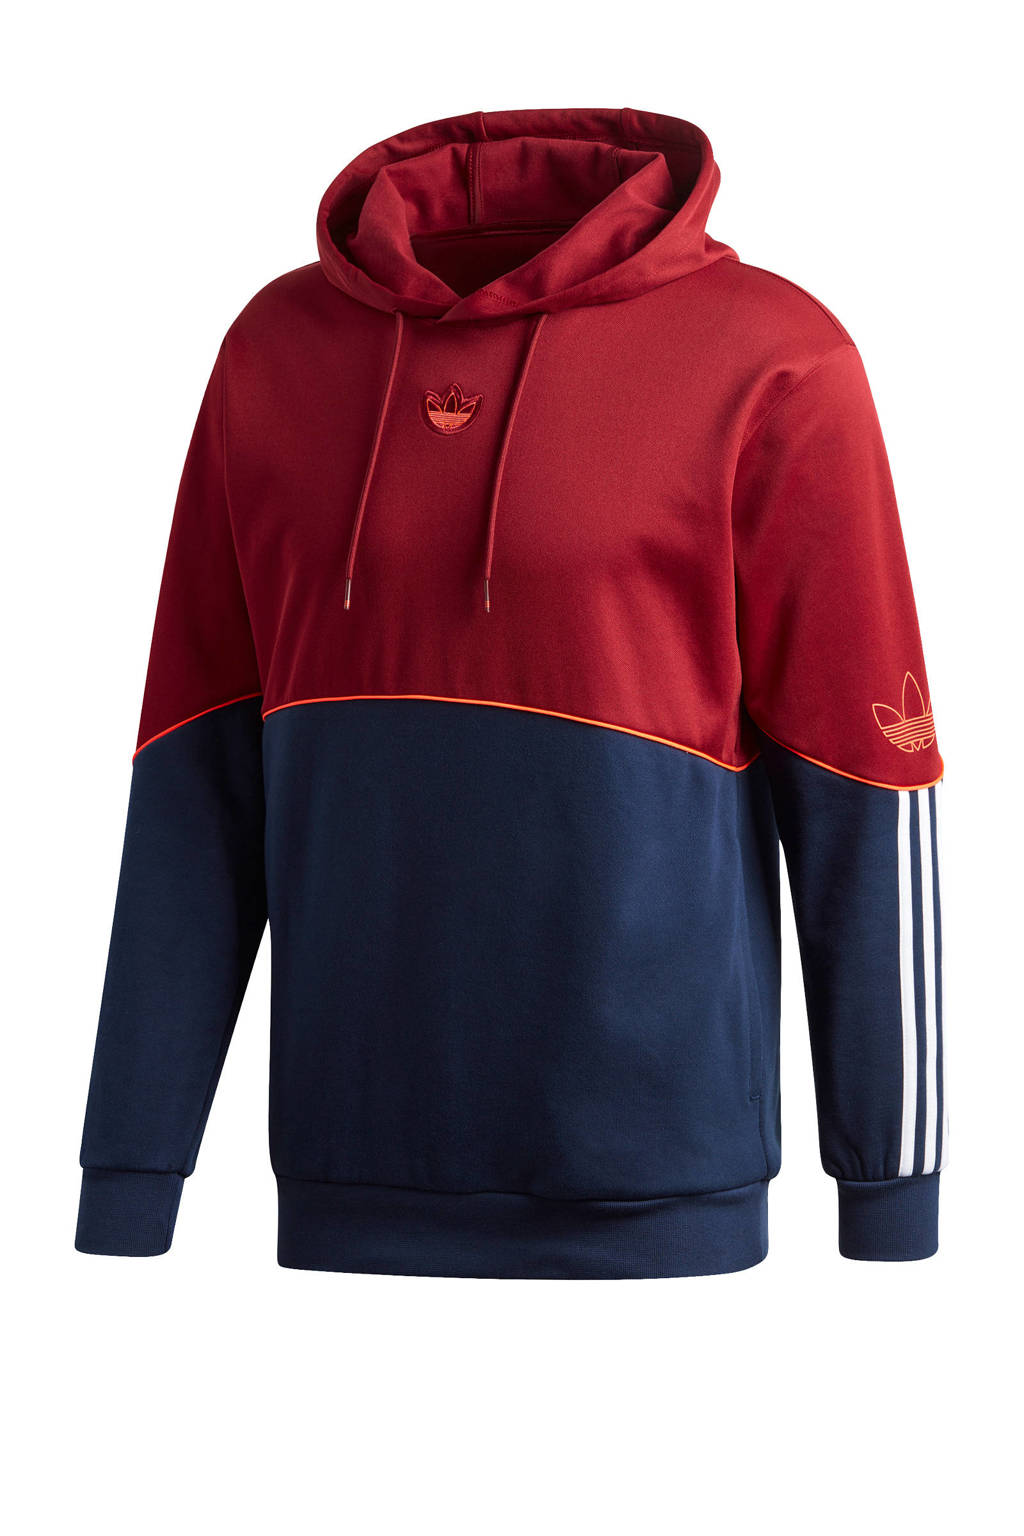 adidas Originals hoodie rood/donkerblauw, Rood/donkerblauw